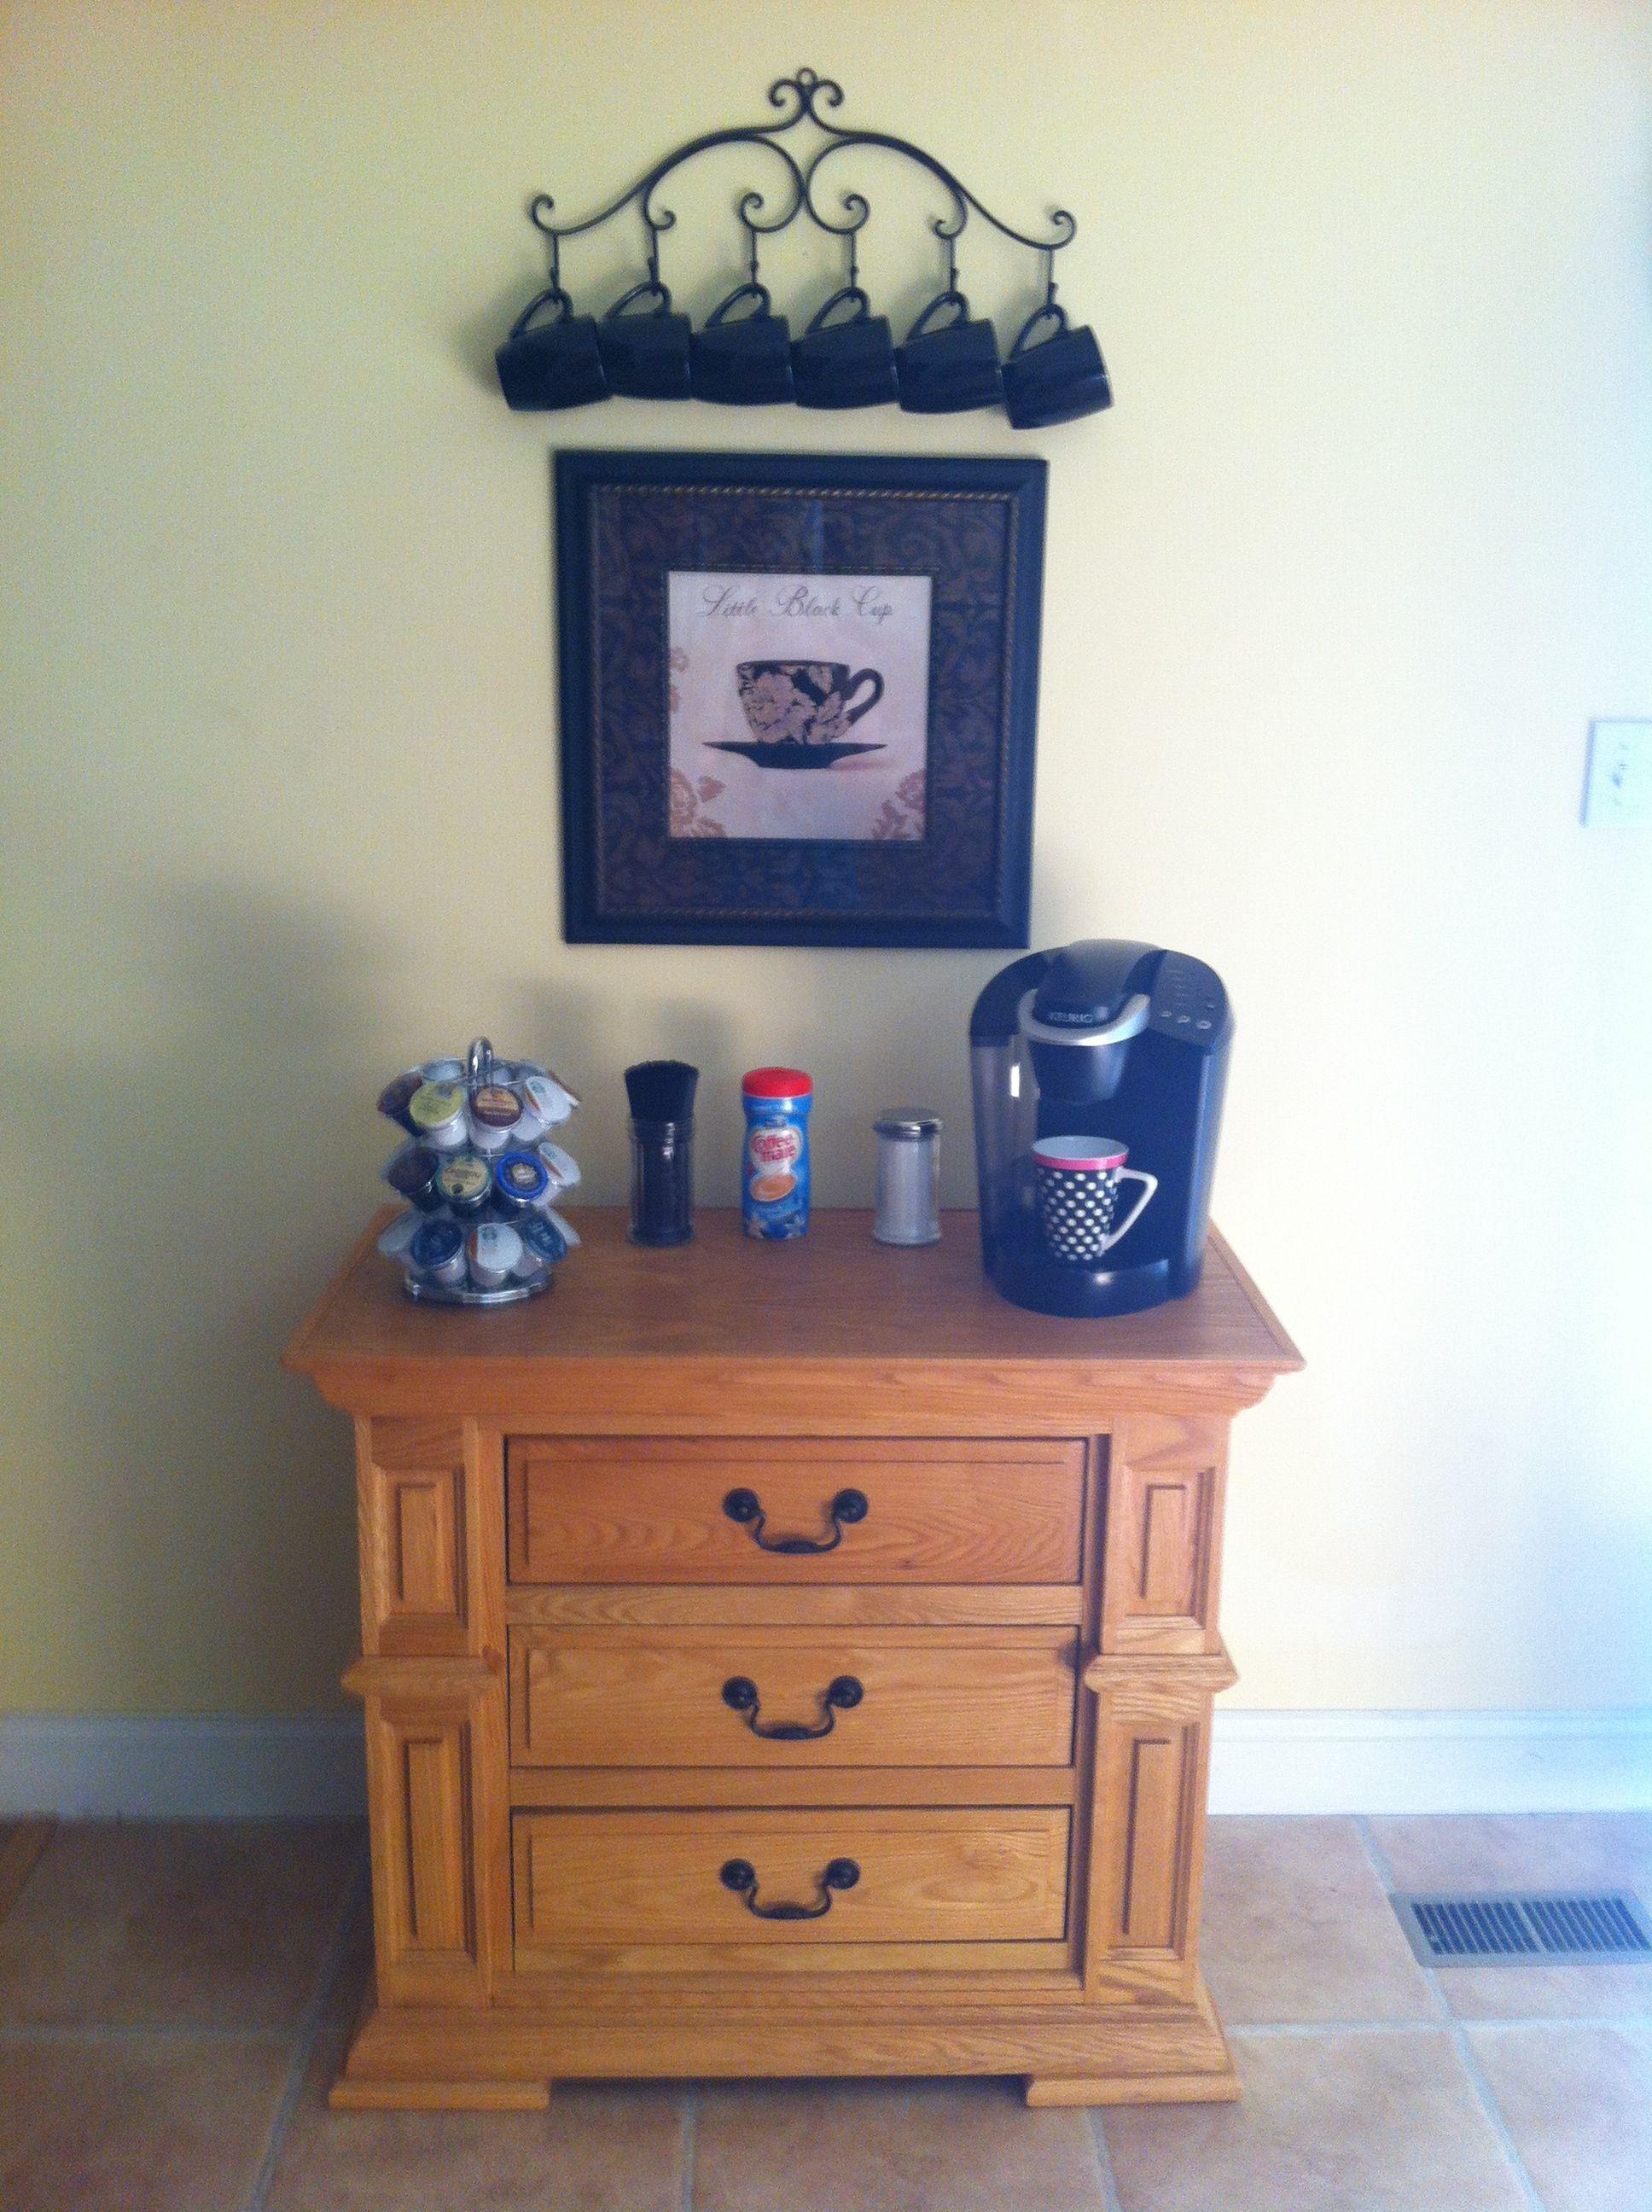 Kitchen Coffee Bar Coffee Bar Home Pinterest Coffee Bar And Kitchen Coffee Bars